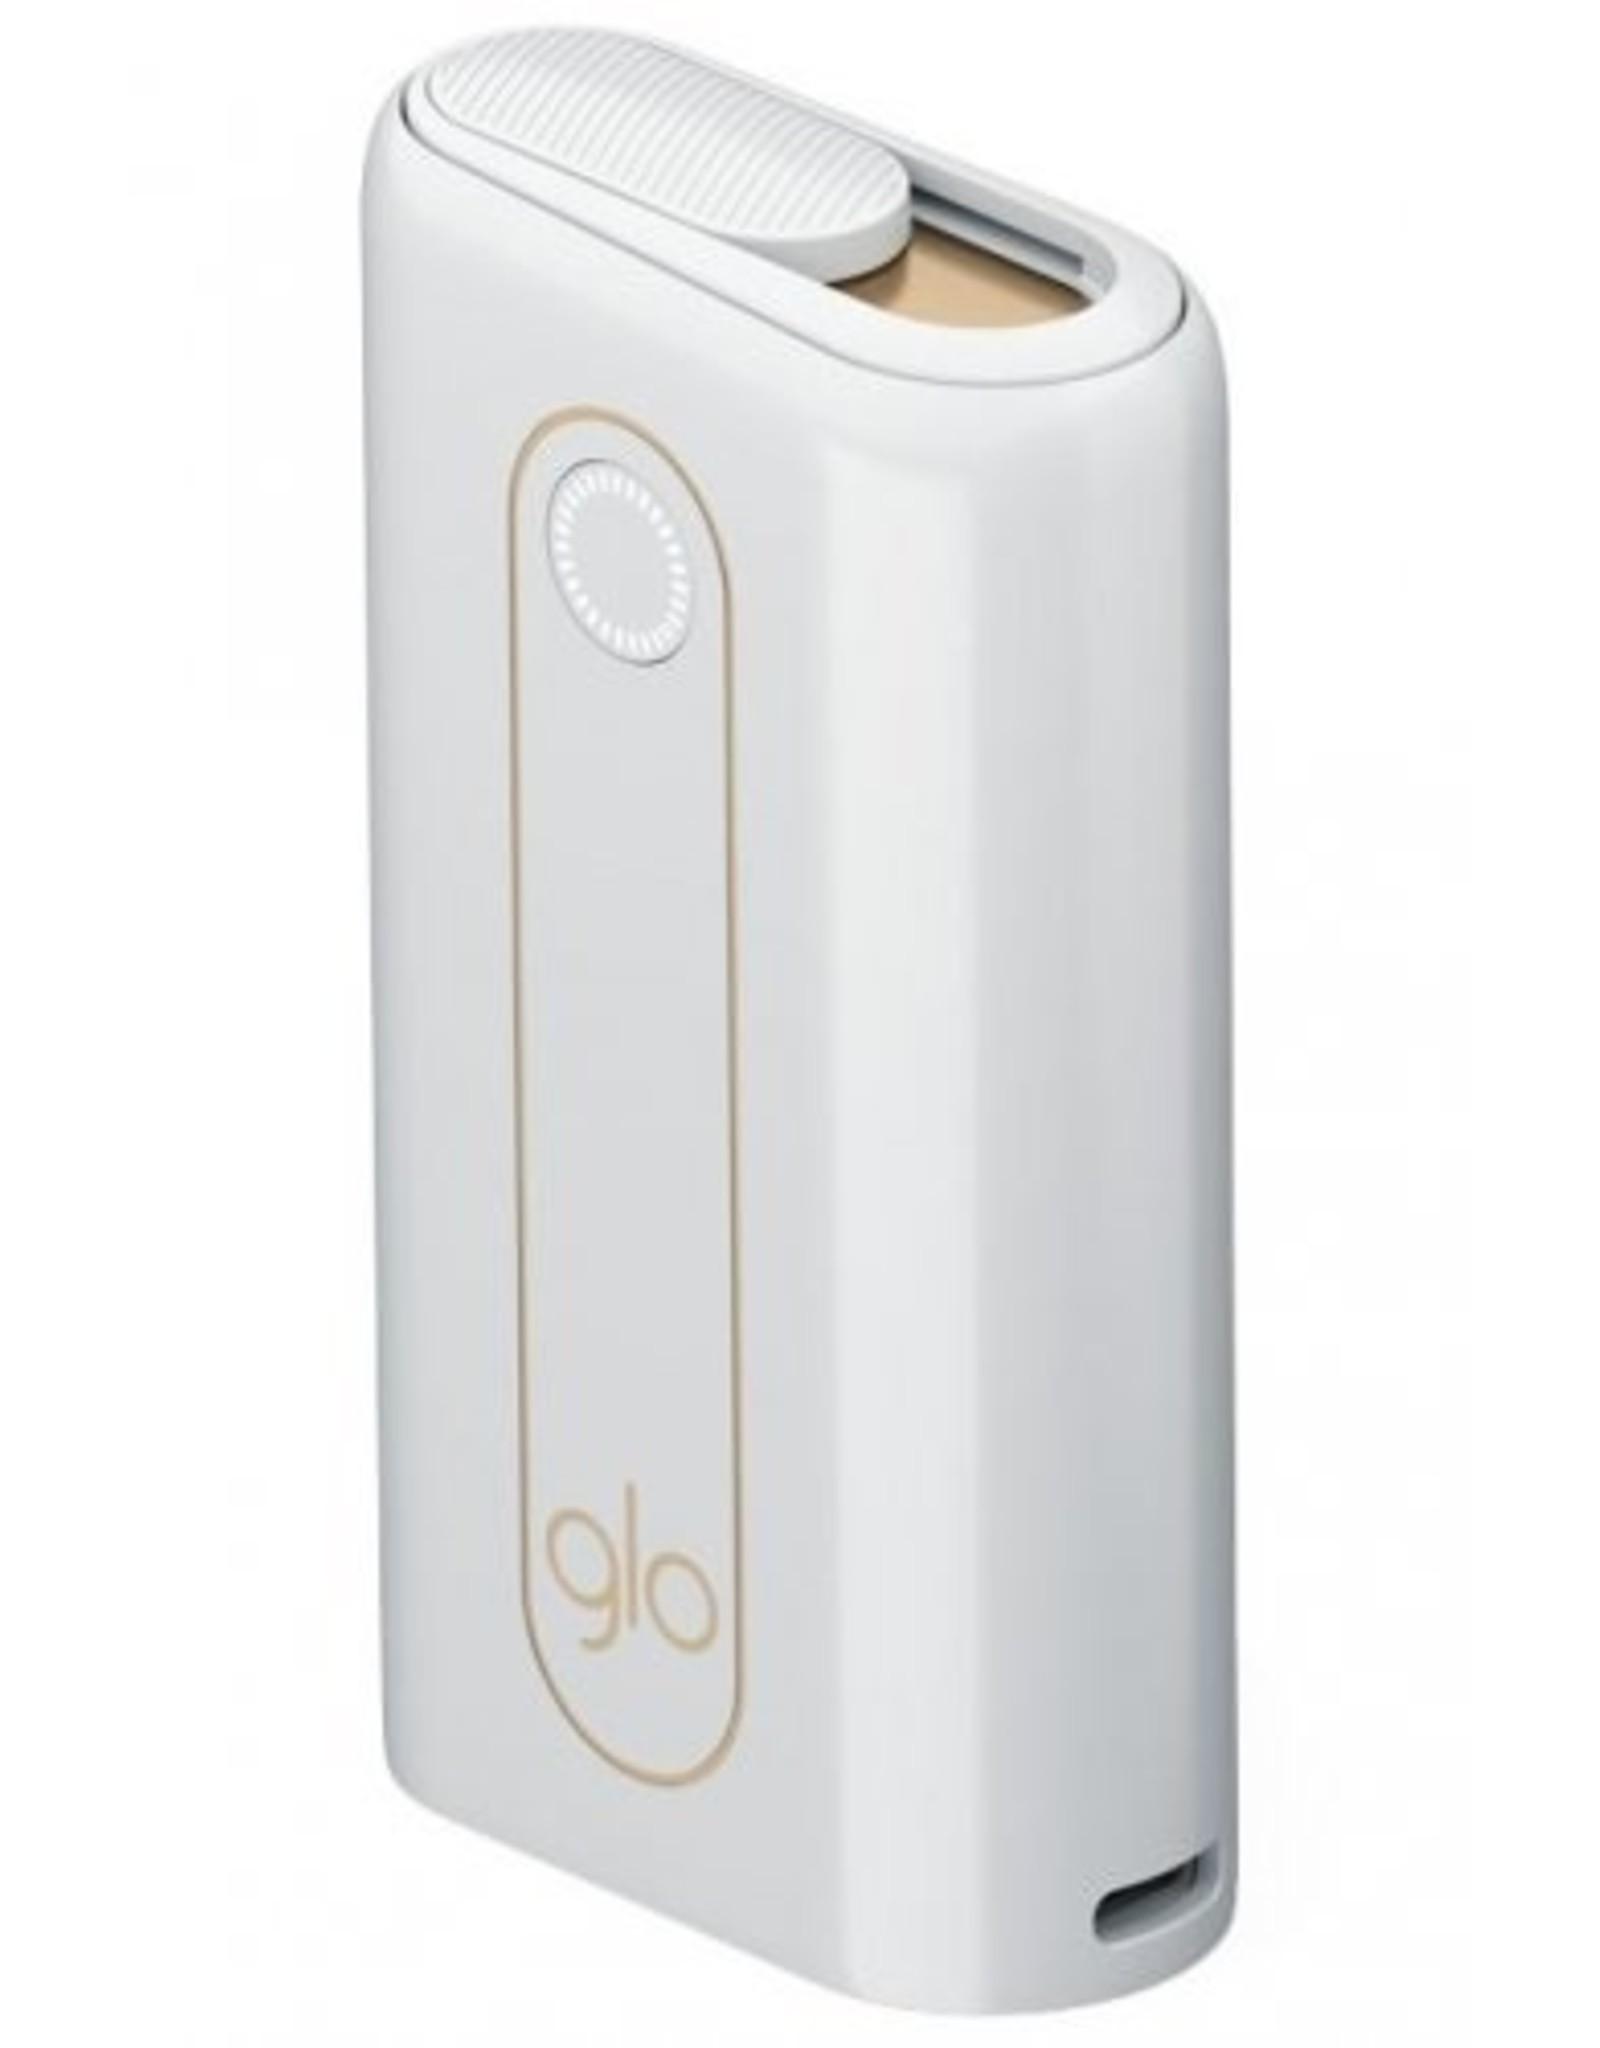 GLO GLO Hyper Device Kit White